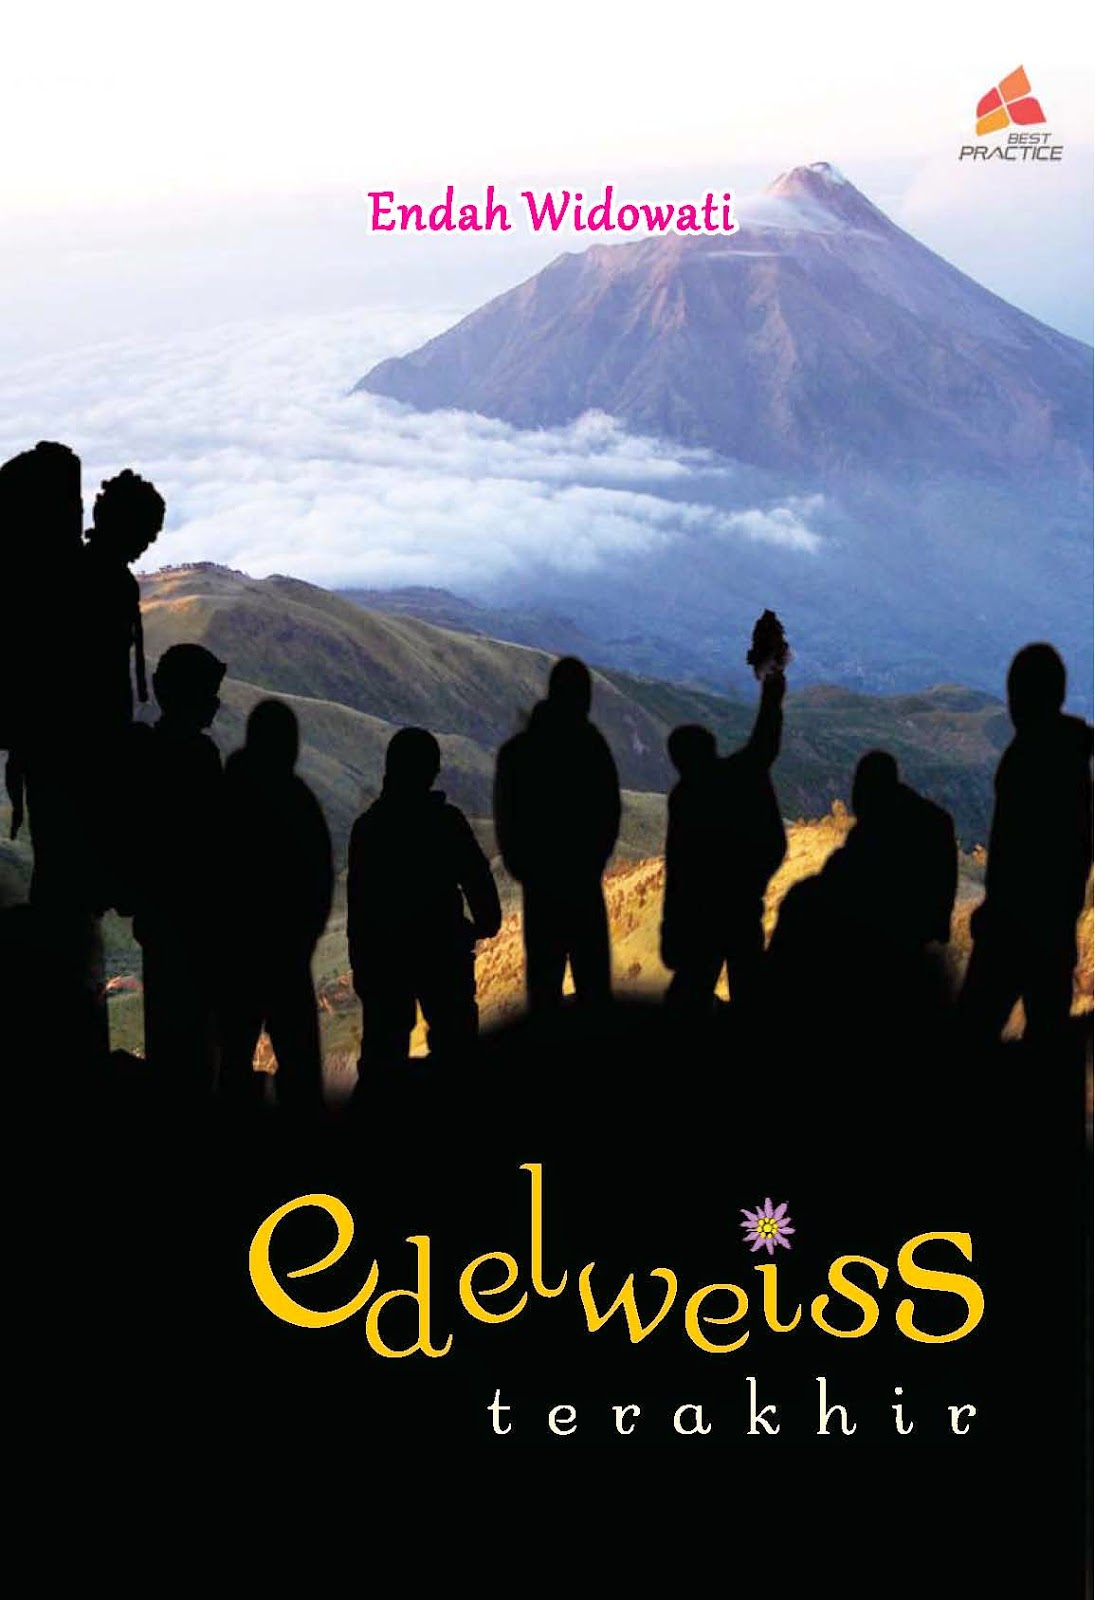 Edelweiss Terakhir